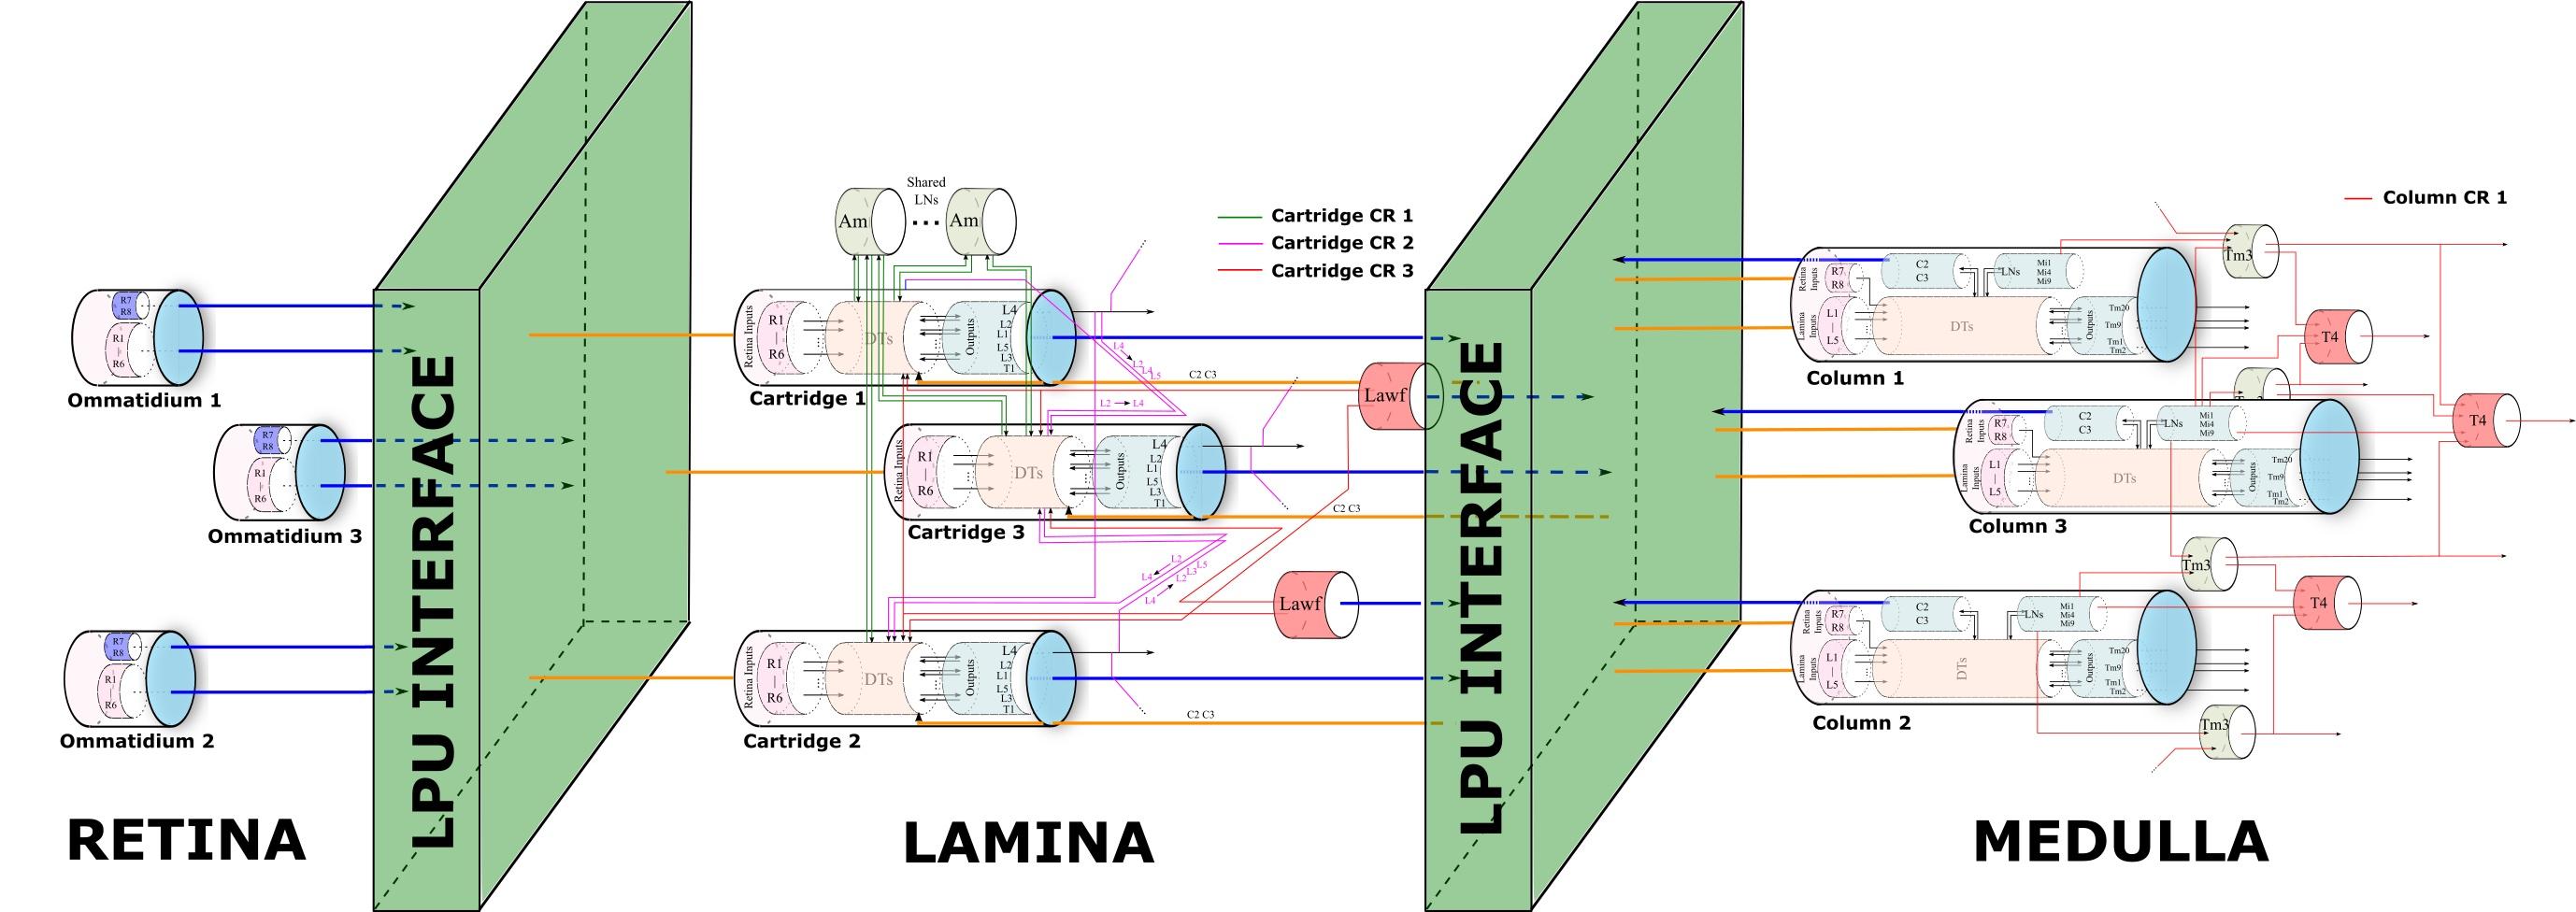 https://raw.githubusercontent.com/bionet/bionet.github.io/img/img/vision.jpg